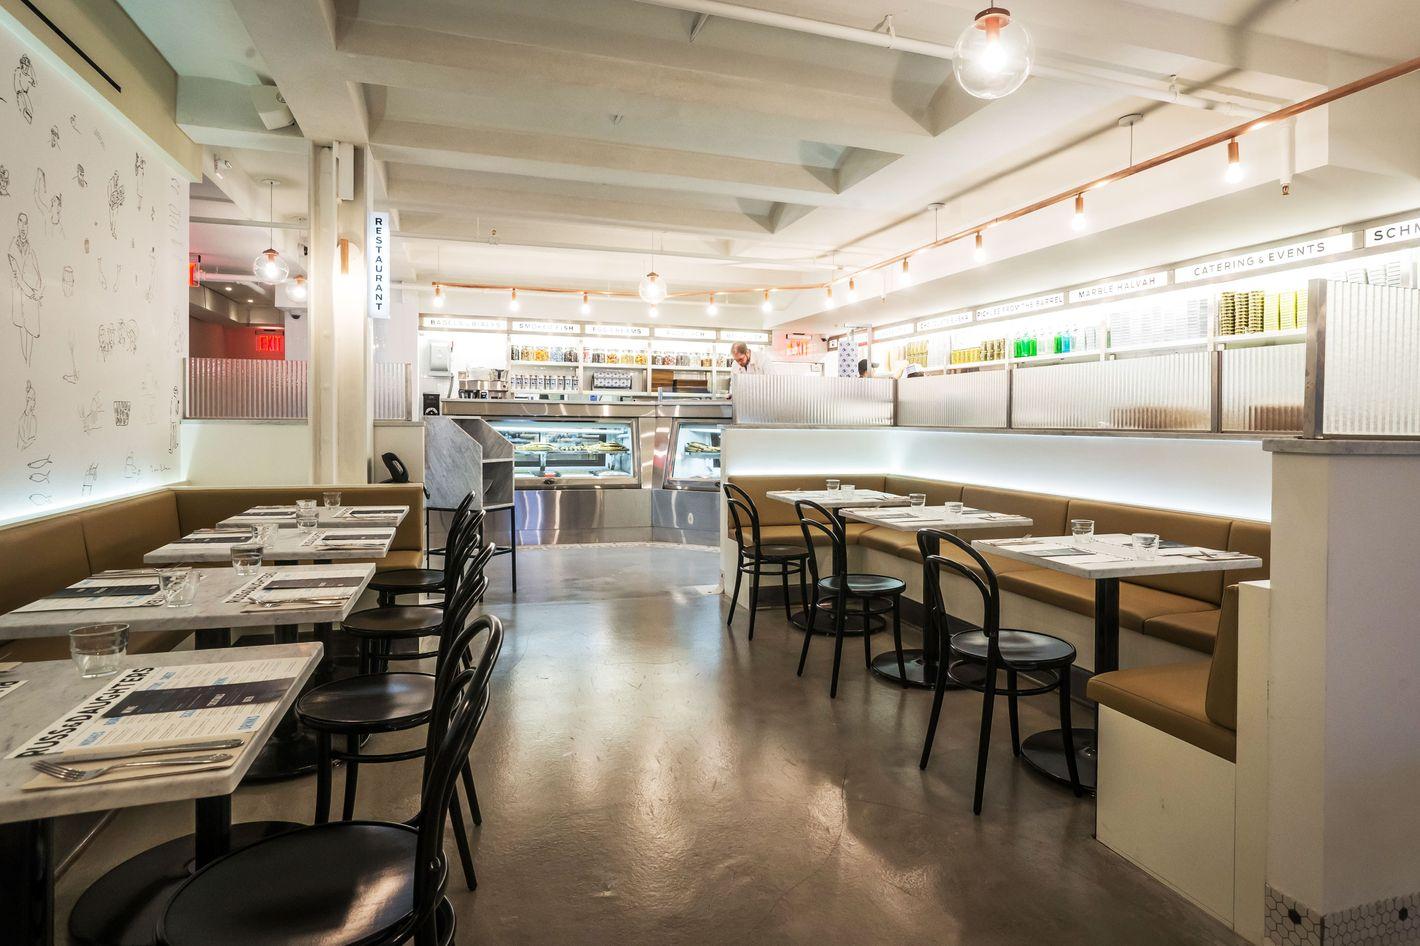 Galia Solomonoff, of Solomonoff Architecture Studio, designed the space.